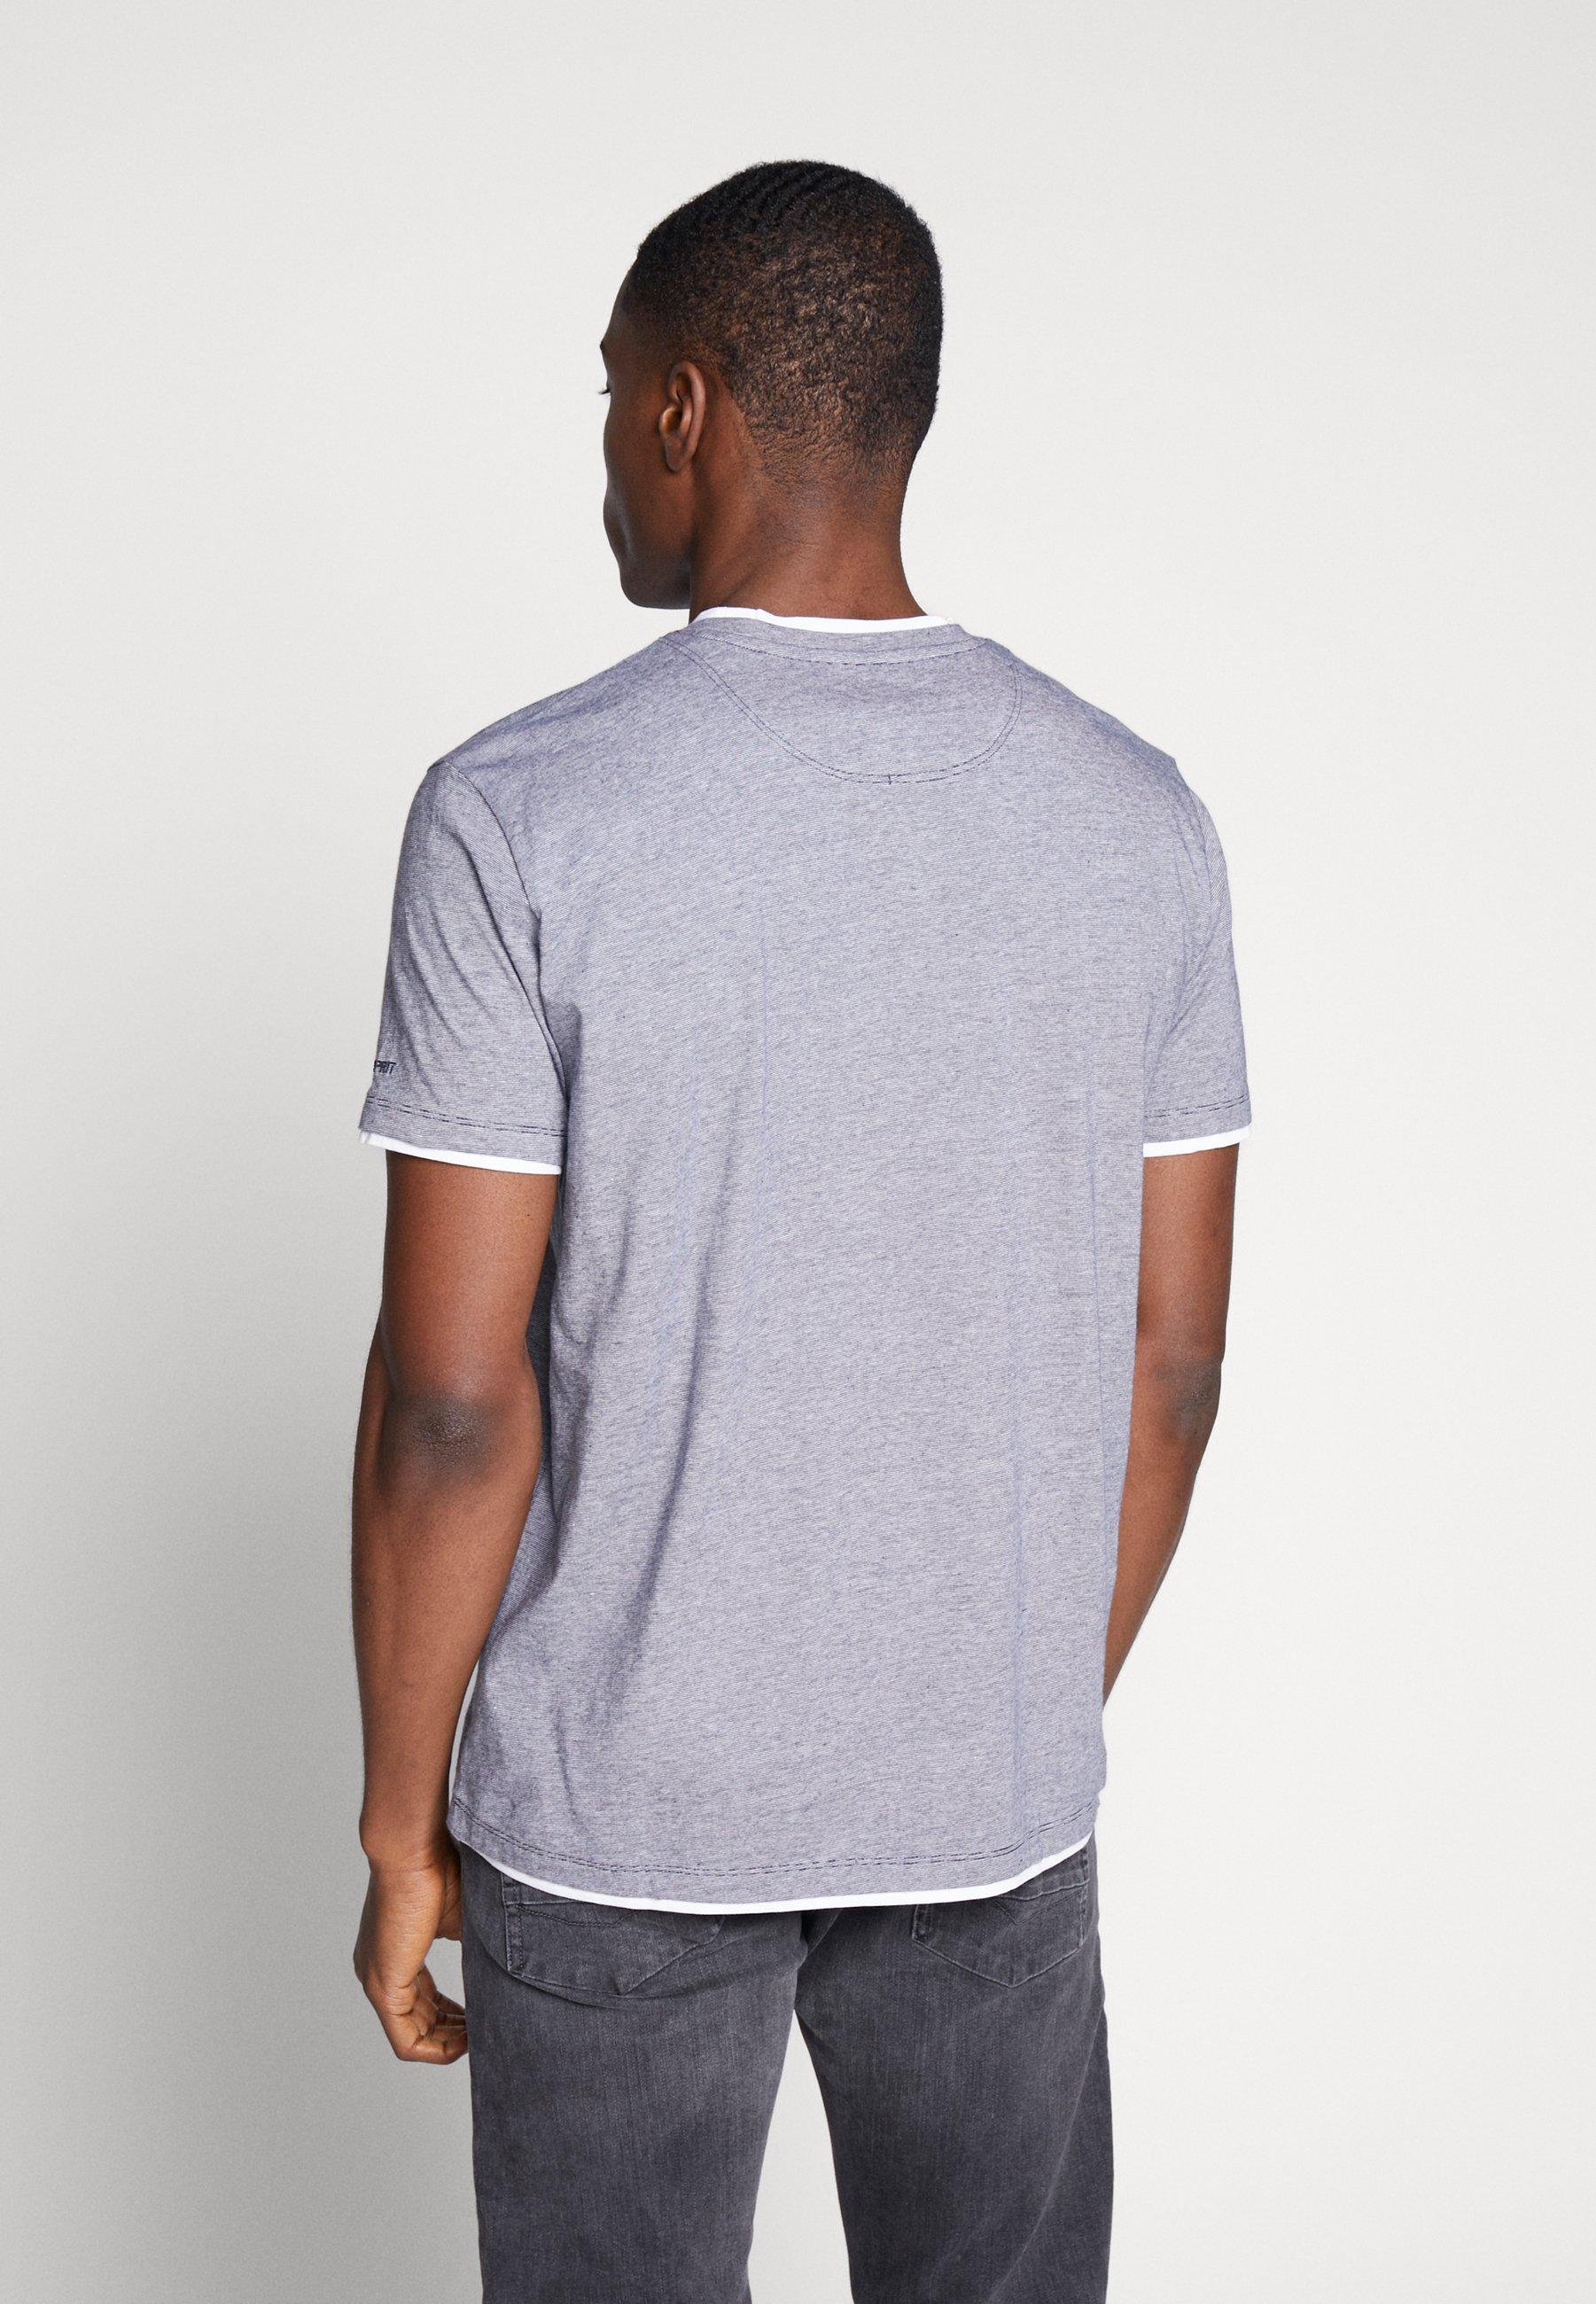 Esprit Print T-shirt - navy QY9ut